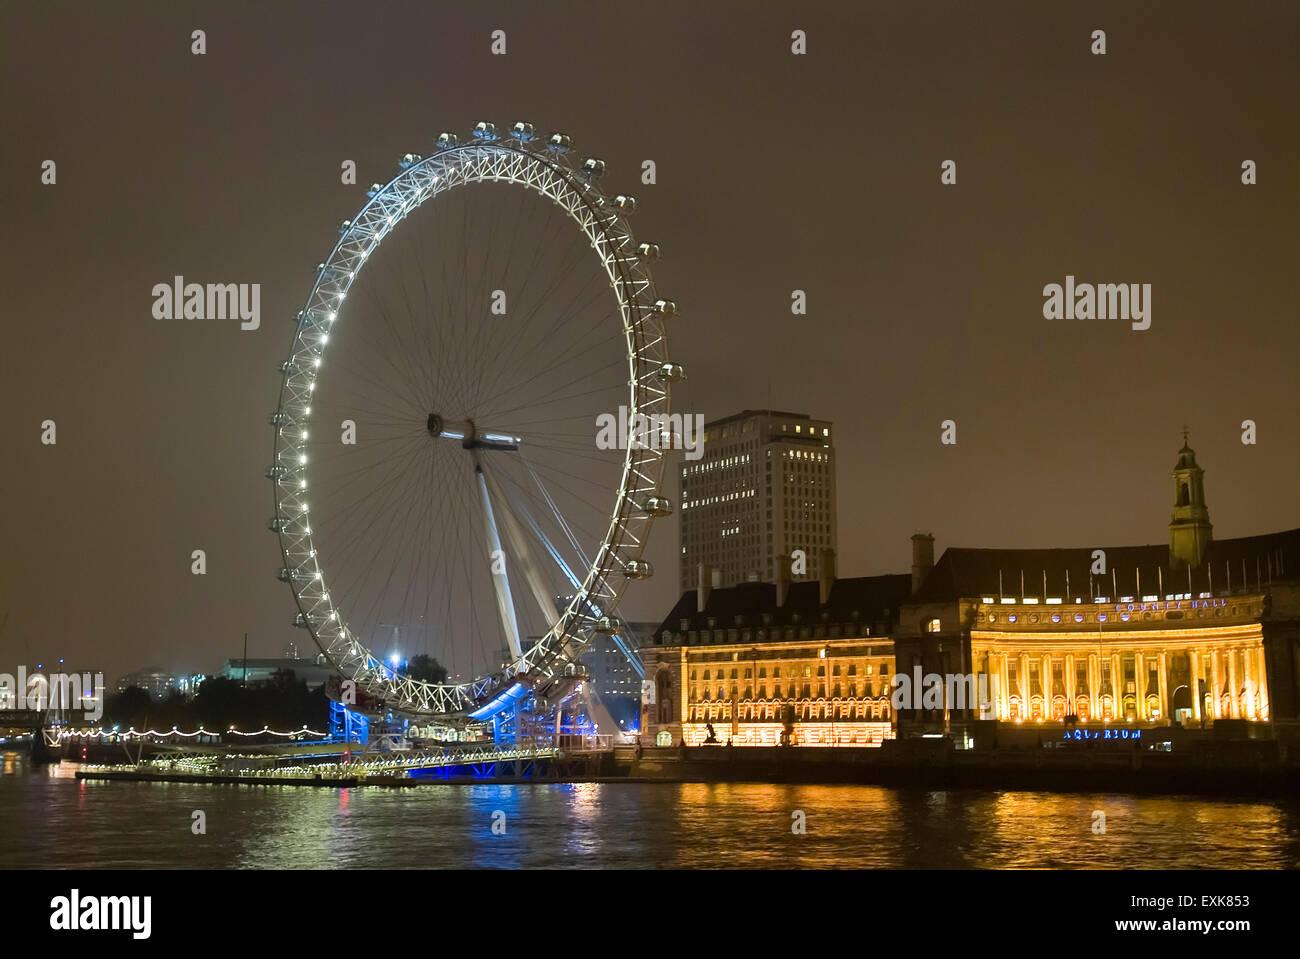 London eye and river themes at night London England UK Europe - Stock Image